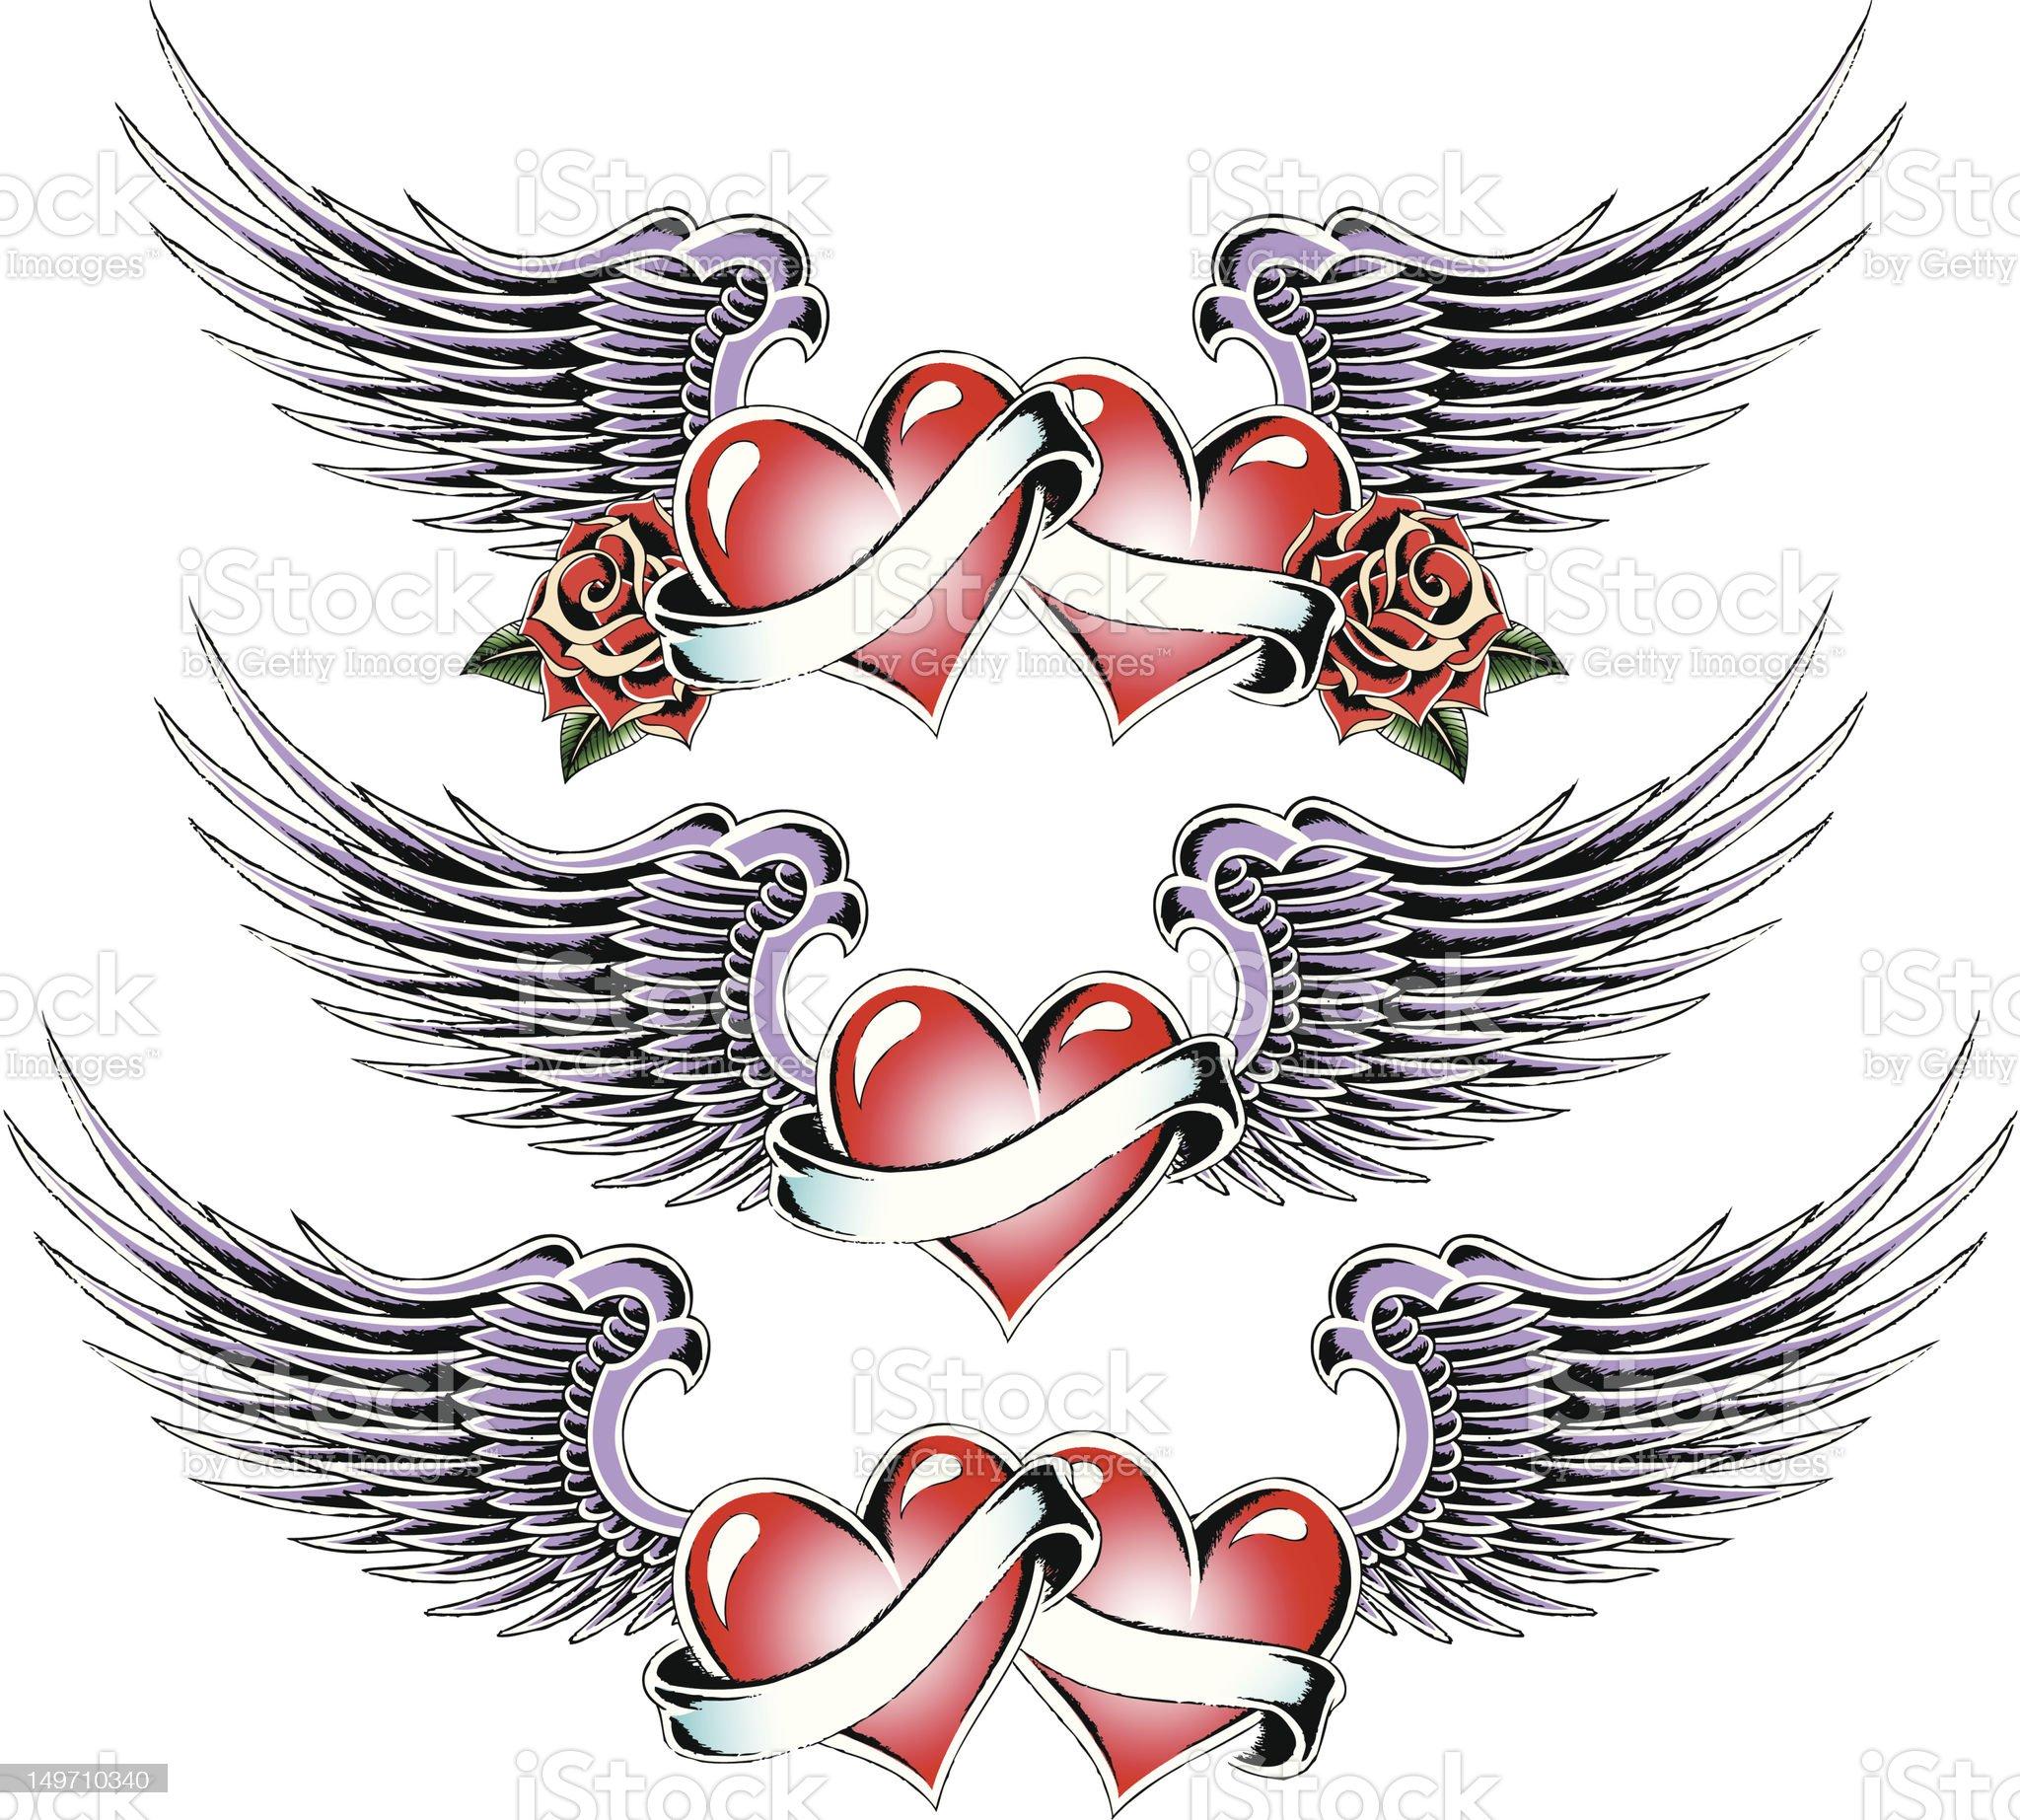 heart tattoo design royalty-free stock vector art